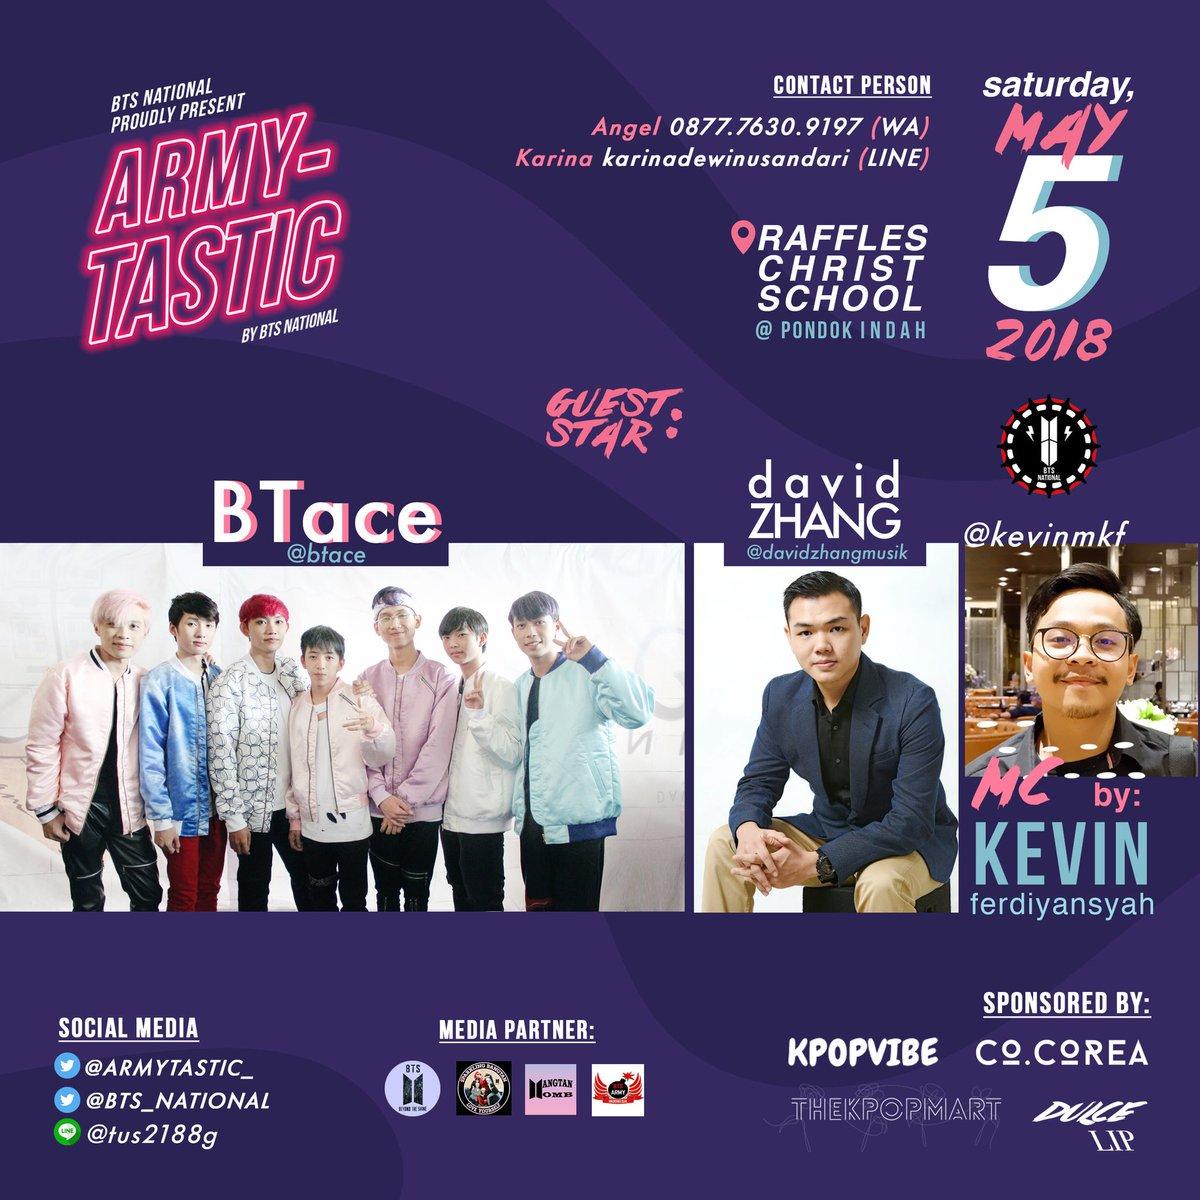 2018 ARMY-TASTIC Party Jakarta Mei 2018 saungkorea.com